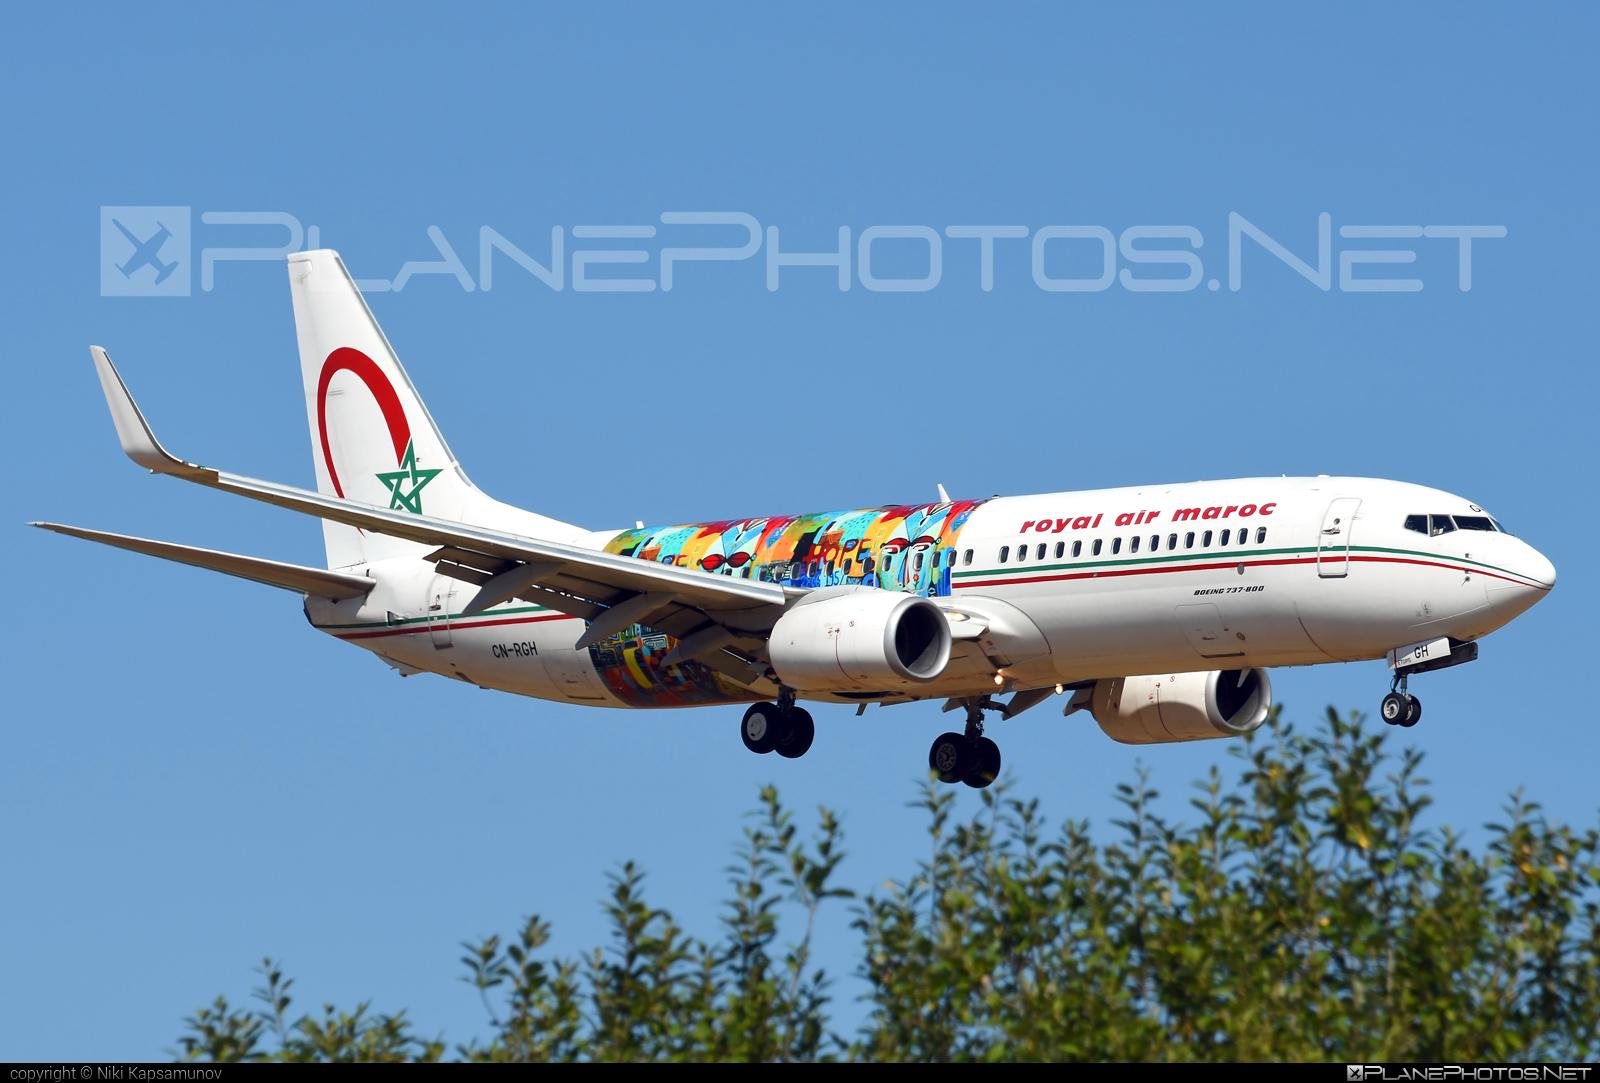 Boeing 737-800 - CN-RGH operated by Royal Air Maroc (RAM) #b737 #b737nextgen #b737ng #boeing #boeing737 #royalairmaroc